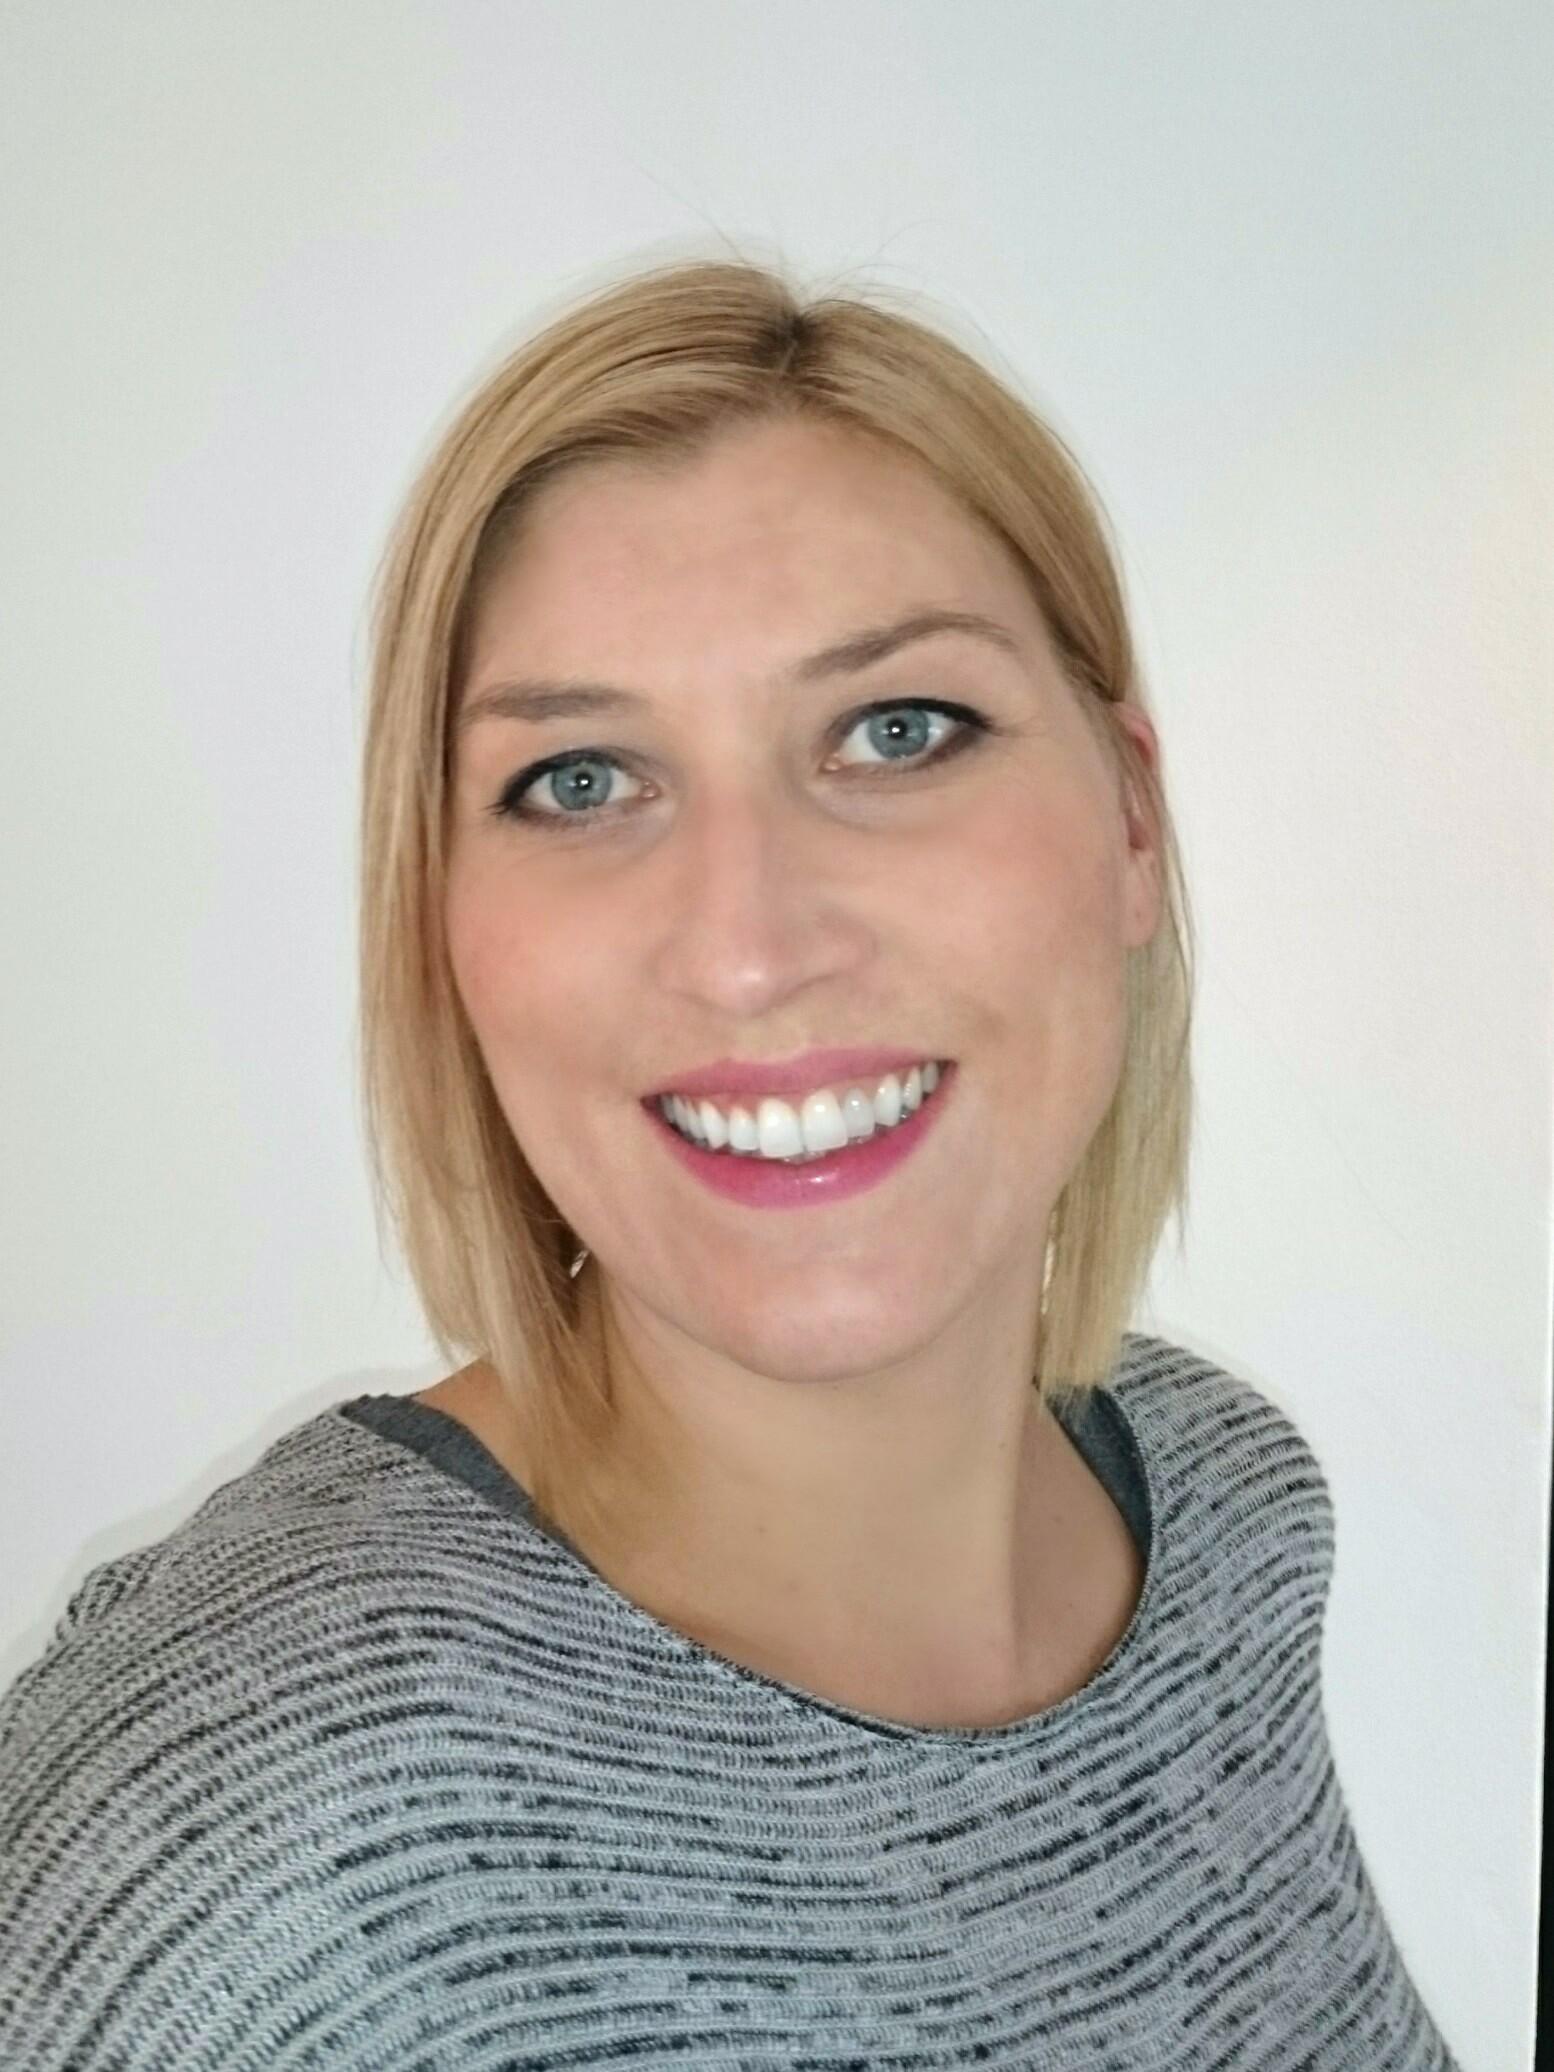 Hilde Sørensen Upsahl